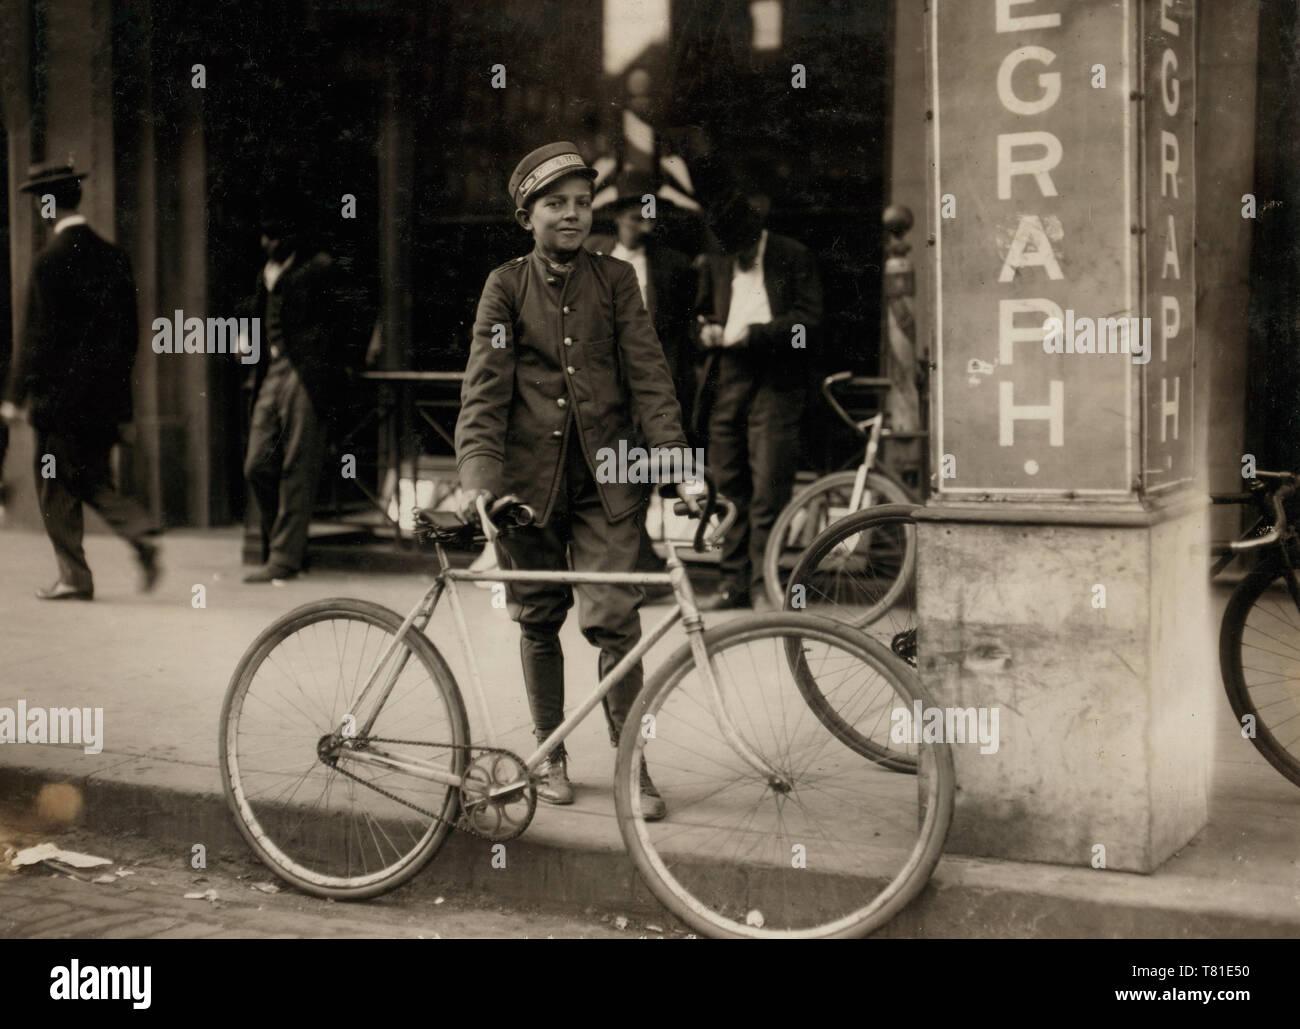 Postal Telegraph messenger. Location: Birmingham, Alabama, November 1910 - Stock Image